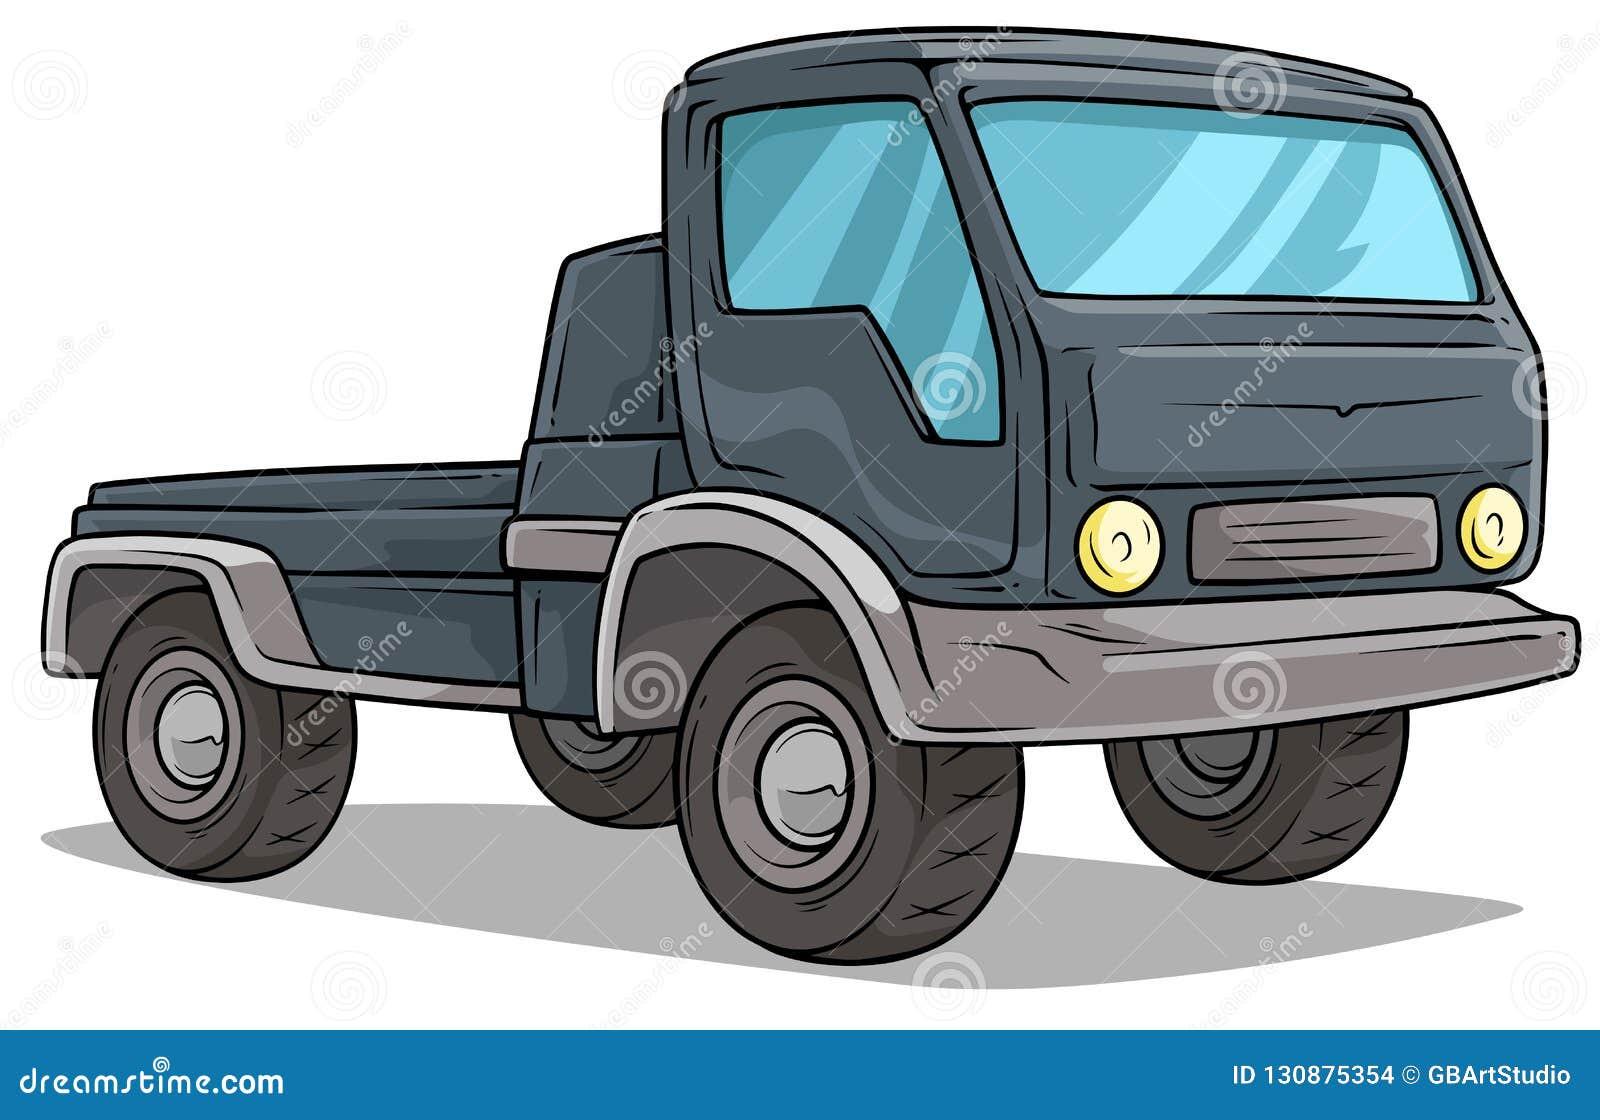 Cartoon Delivery Onboard Cargo Truck Vector Icon Stock ...